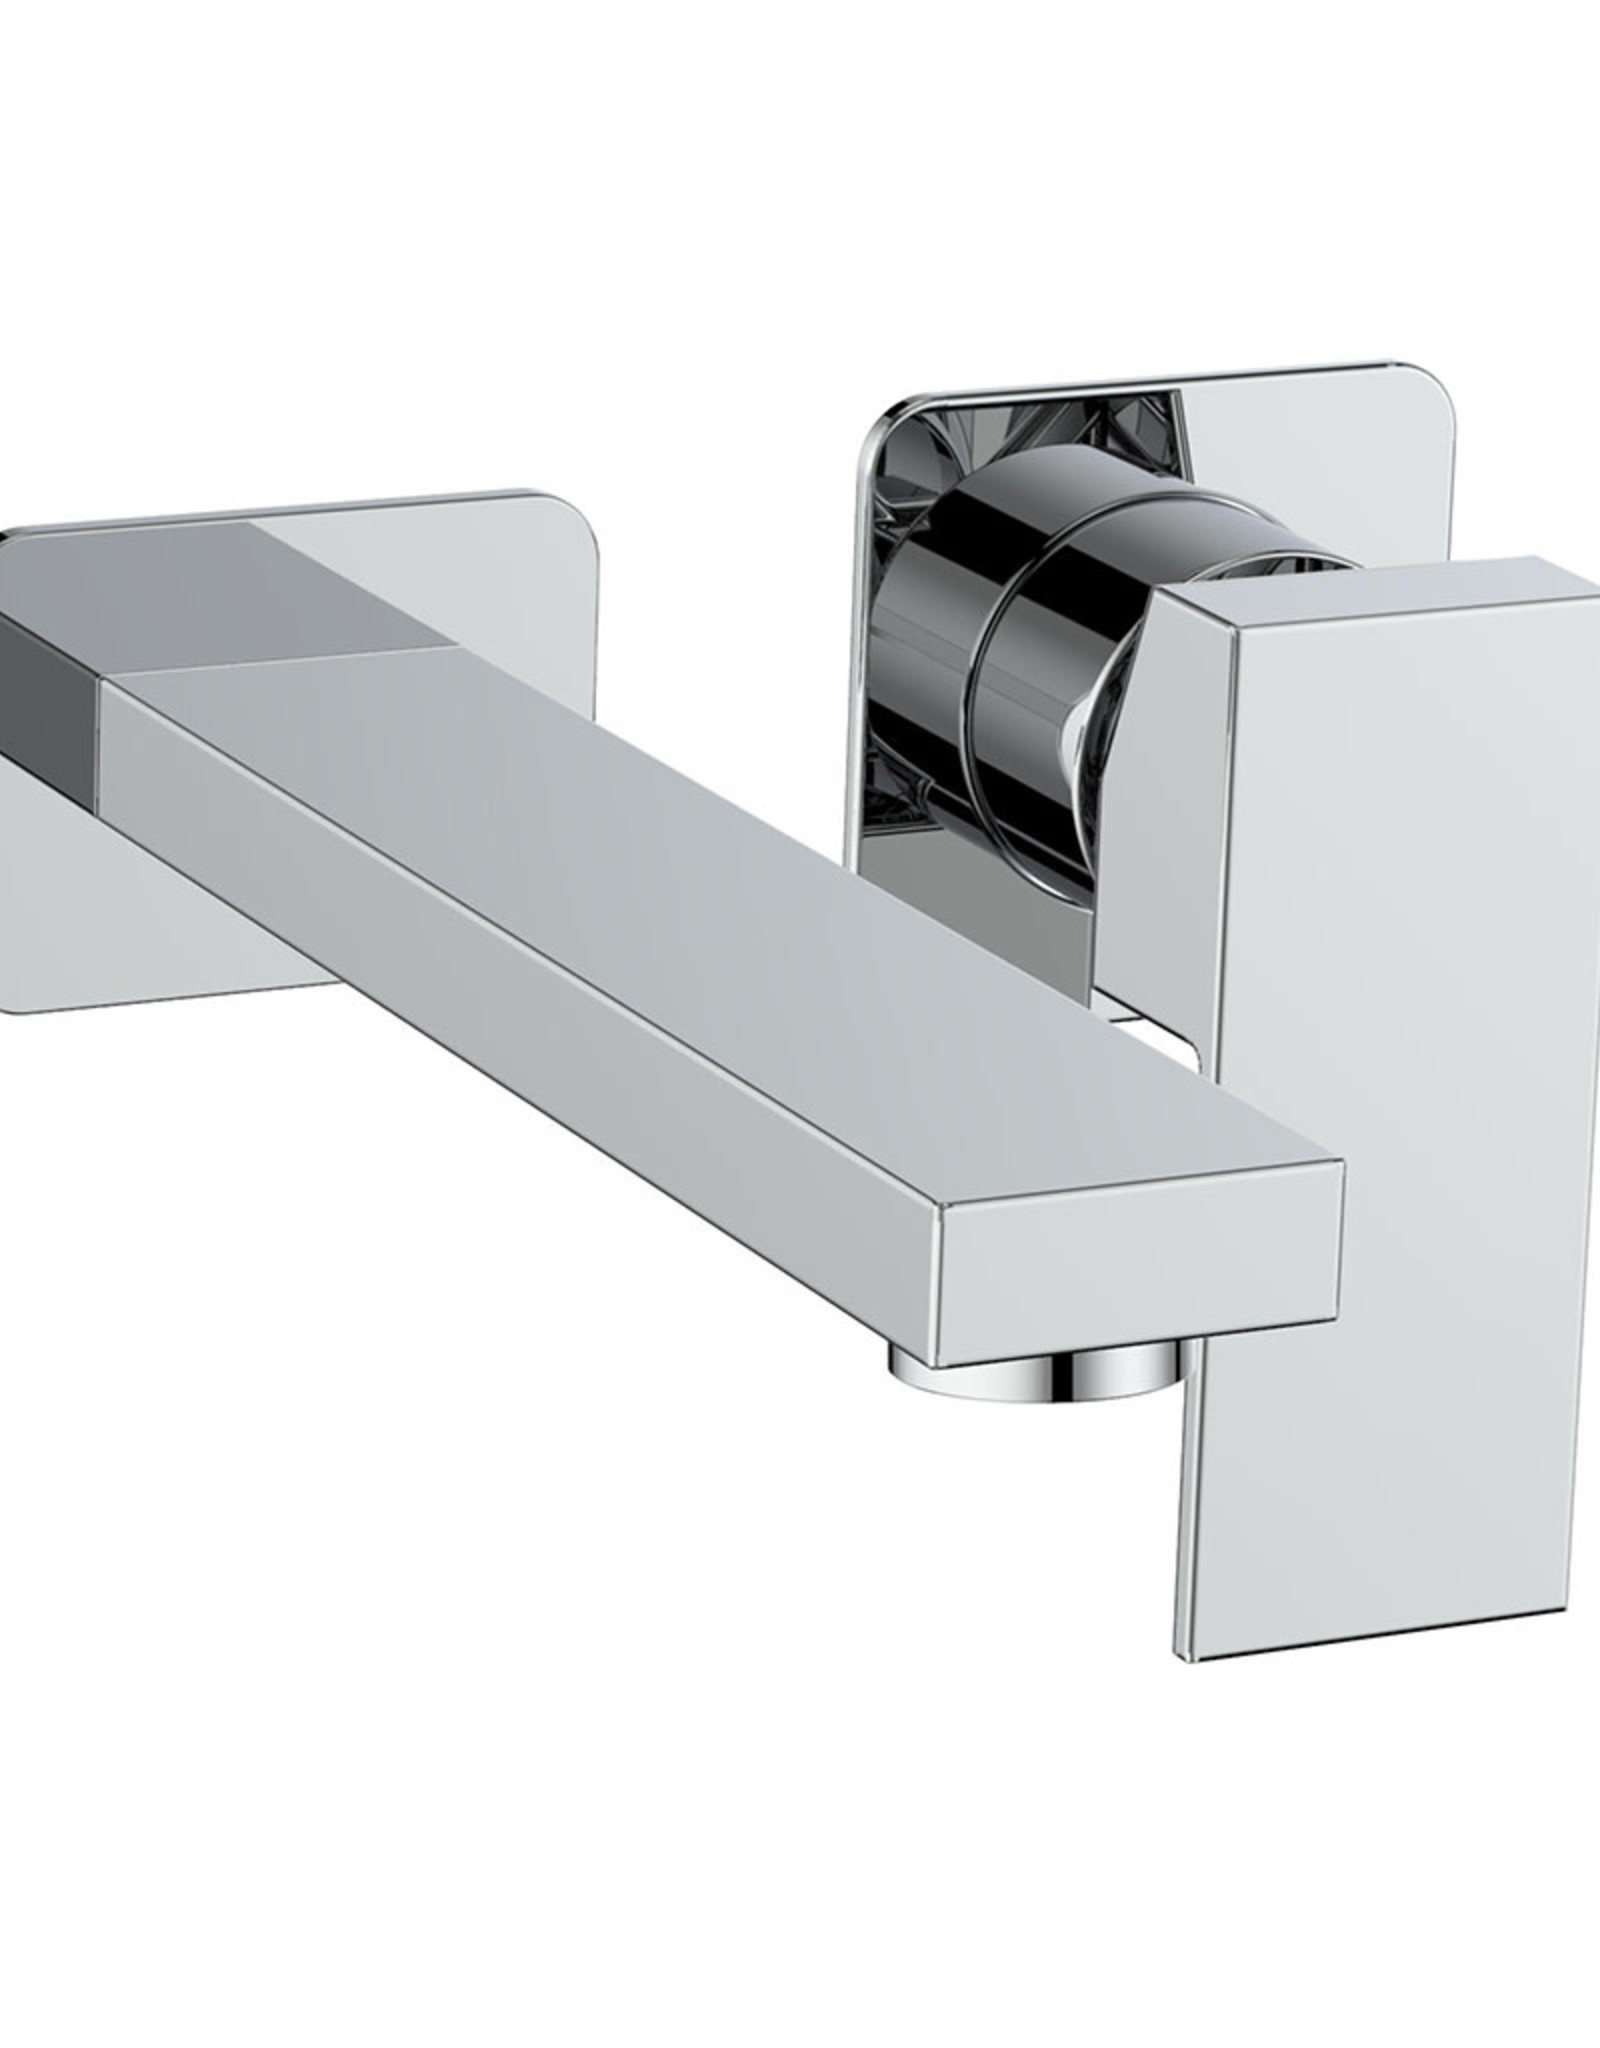 Vogt Kapfenberg- Wall Mounted Lav Faucet- Chrome